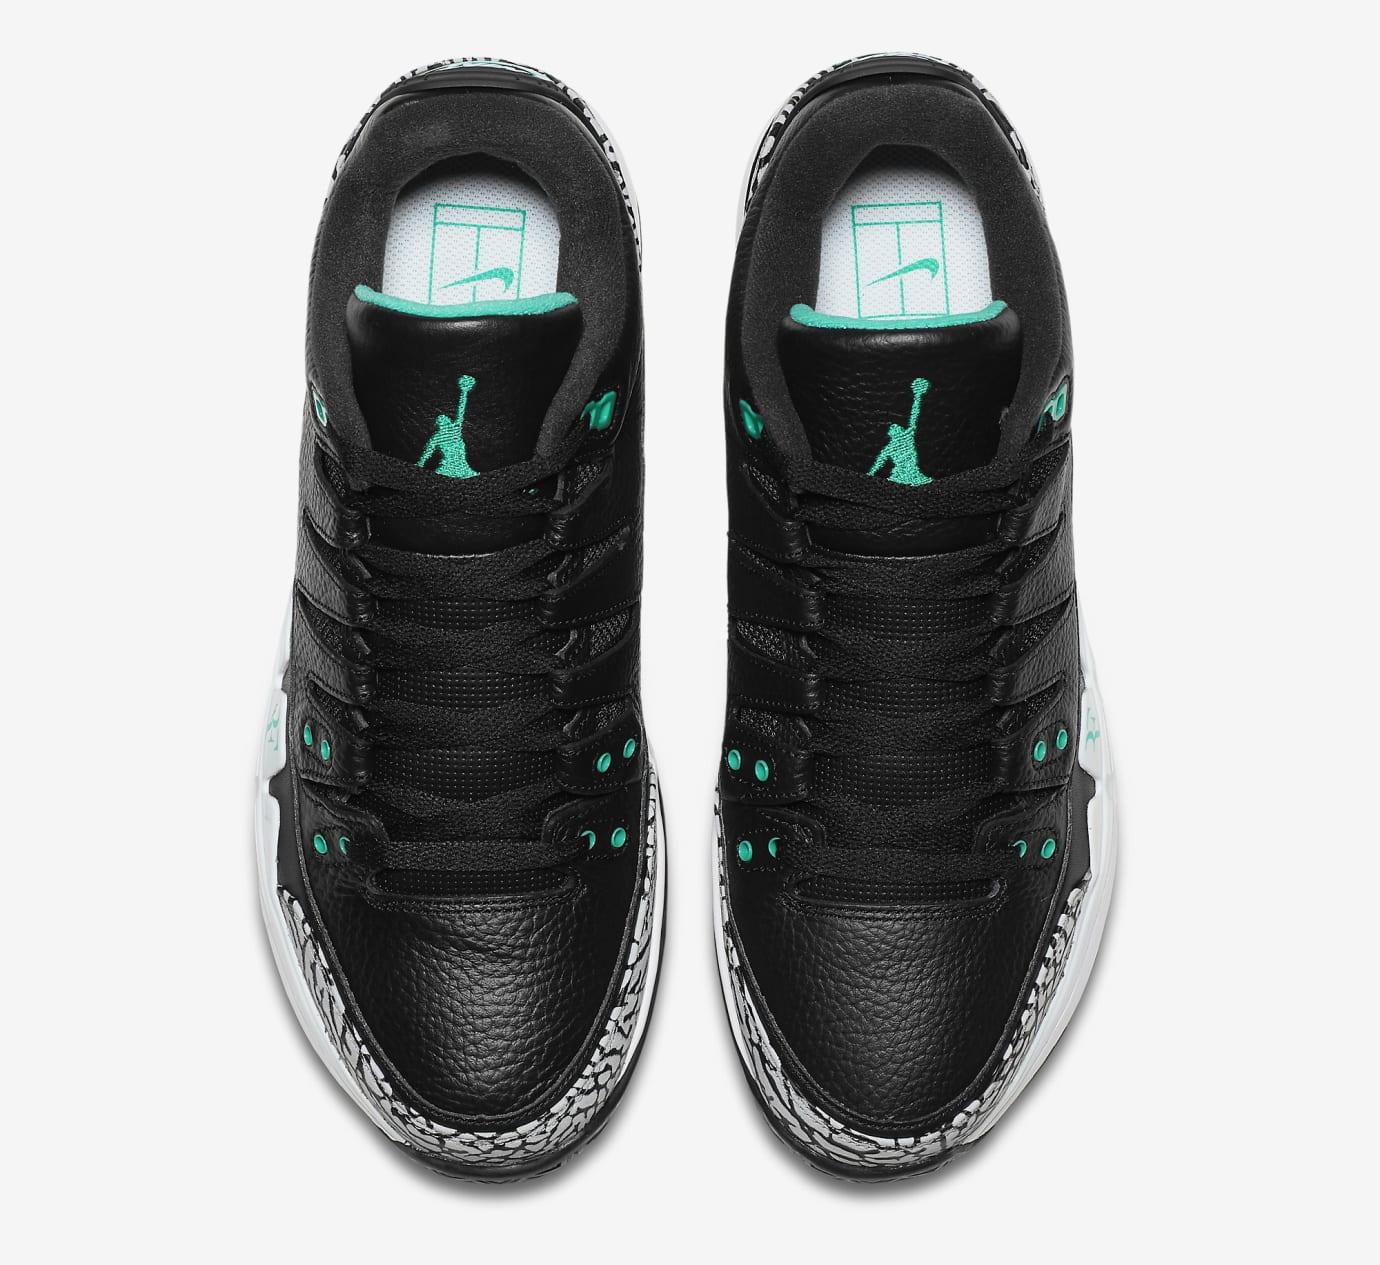 a75bd3f3c32b7b Nike Zoom Vapor Air Jordan 3 Atmos Black Jade 709998-031 Release ...